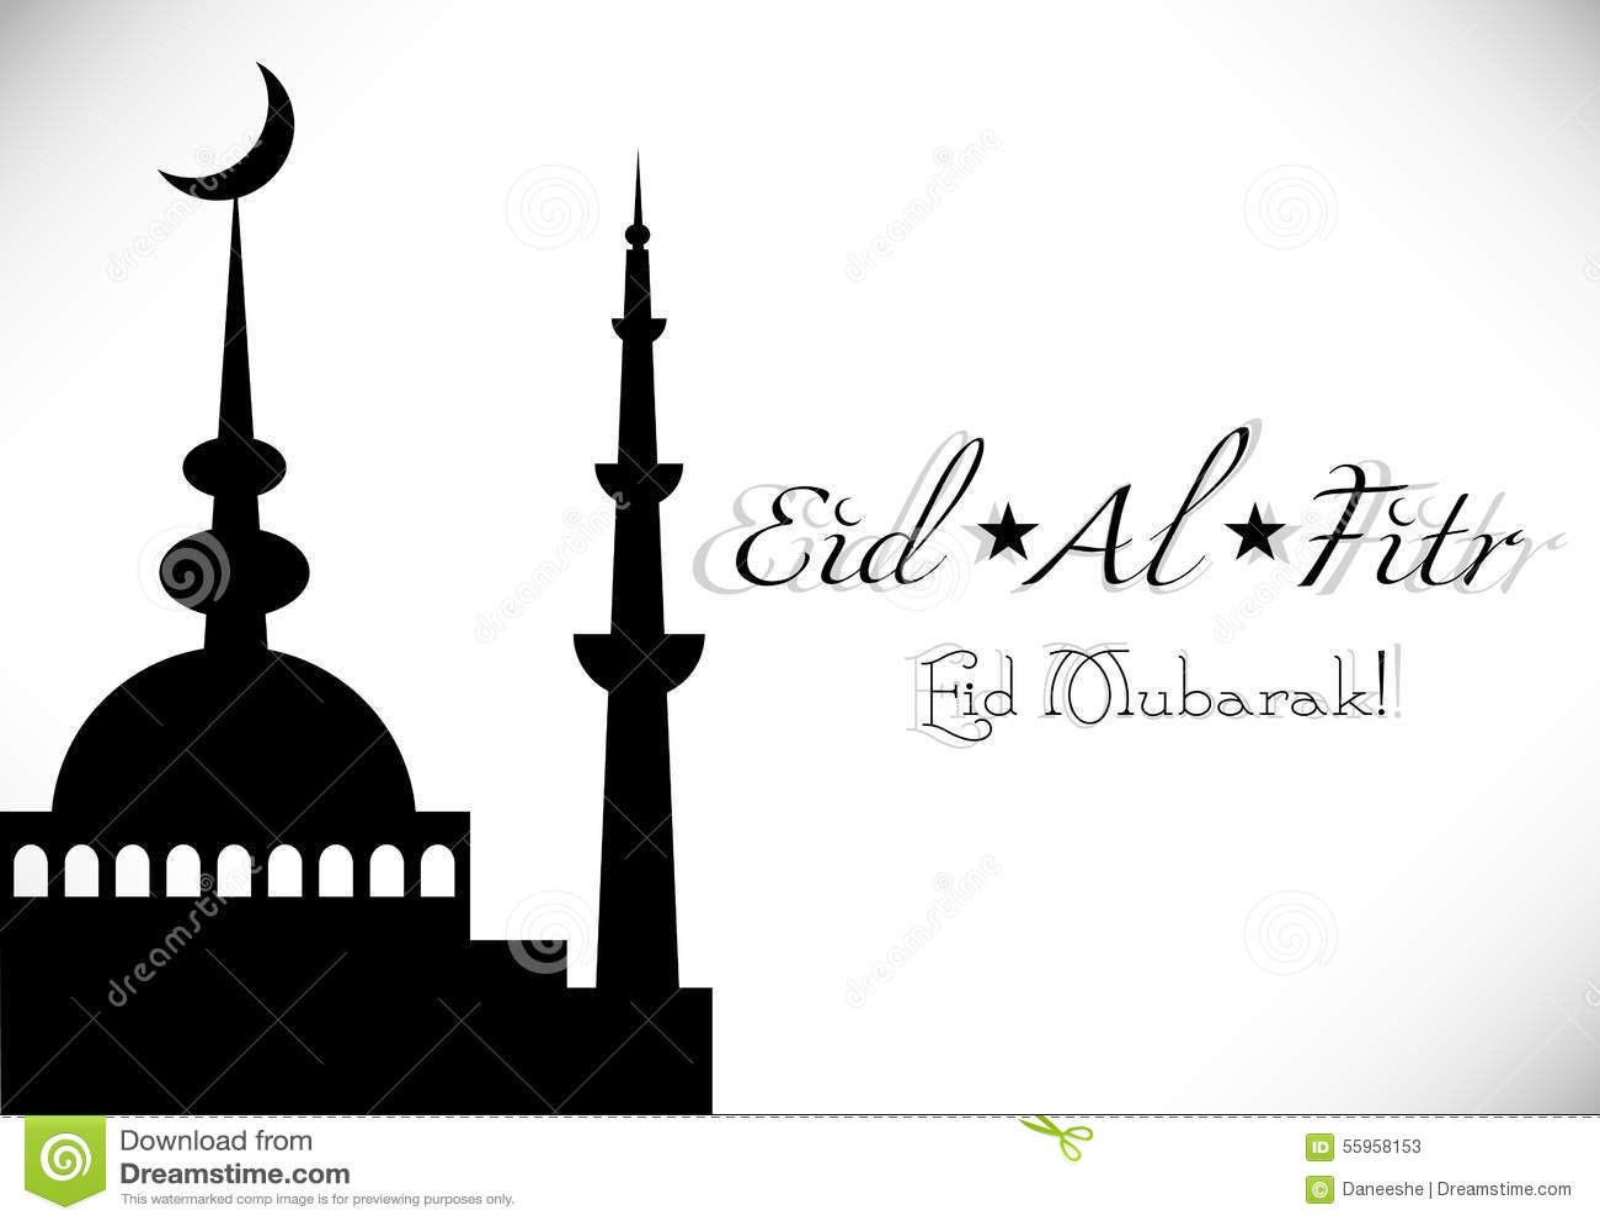 Must see Eid Special Eid Al-Fitr Feast - card-greeting-islamic-feast-eid-al-fitr-mosque-white-finishing-fasting-month-ramadan-holiday-vector-illustration-55958153  Photograph_38533 .jpg